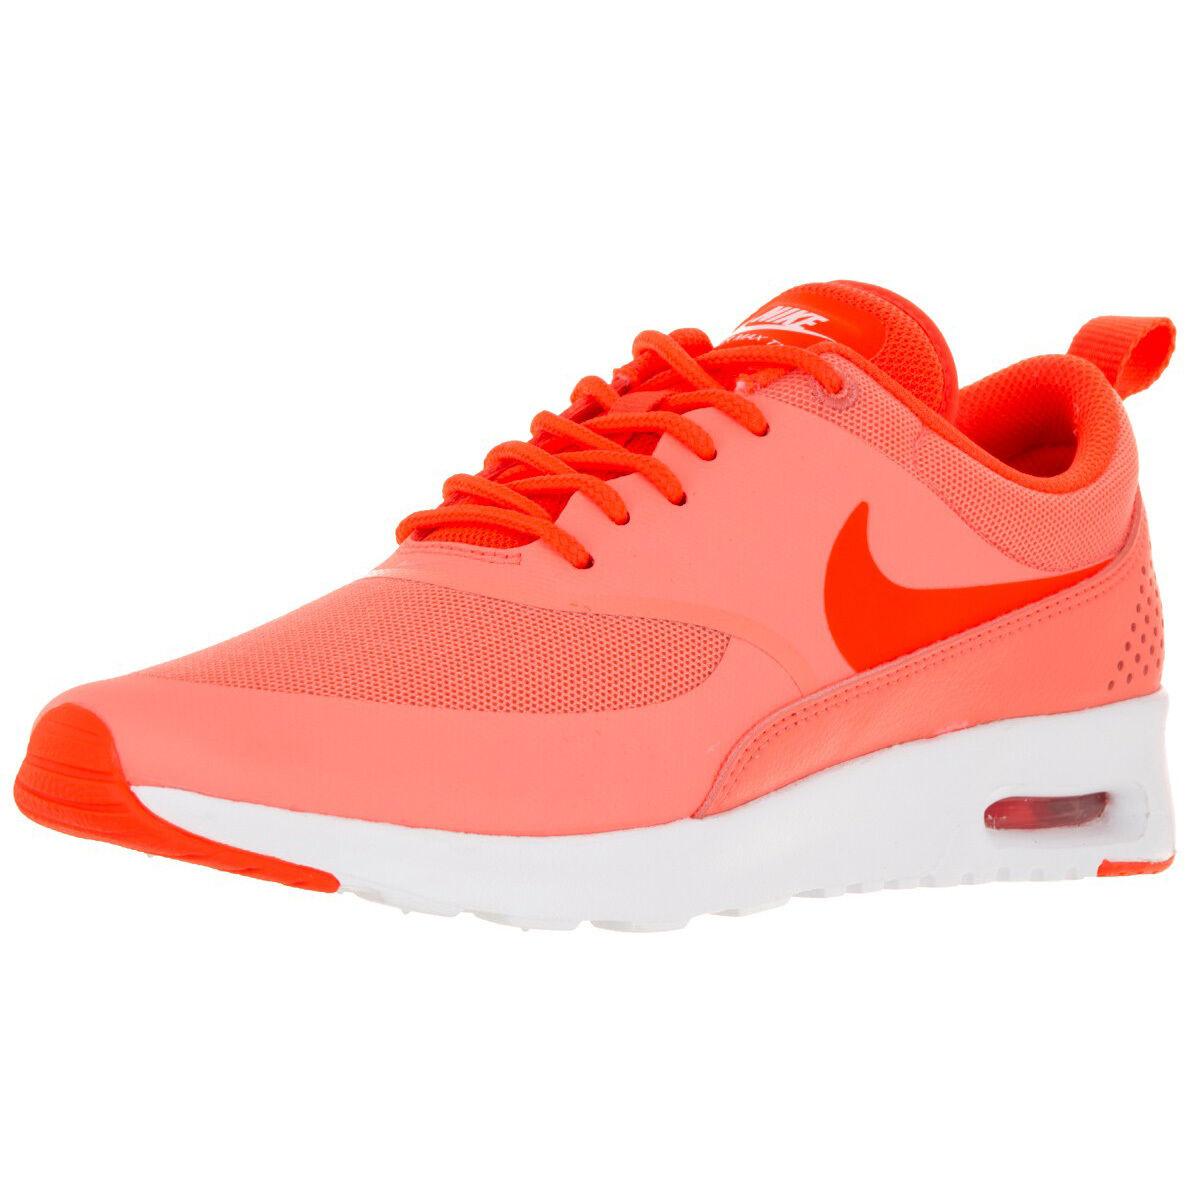 Nike Women's Air Max Thea Shoe 599409-608 Pink/Crimson/White Price reduction Brand discount